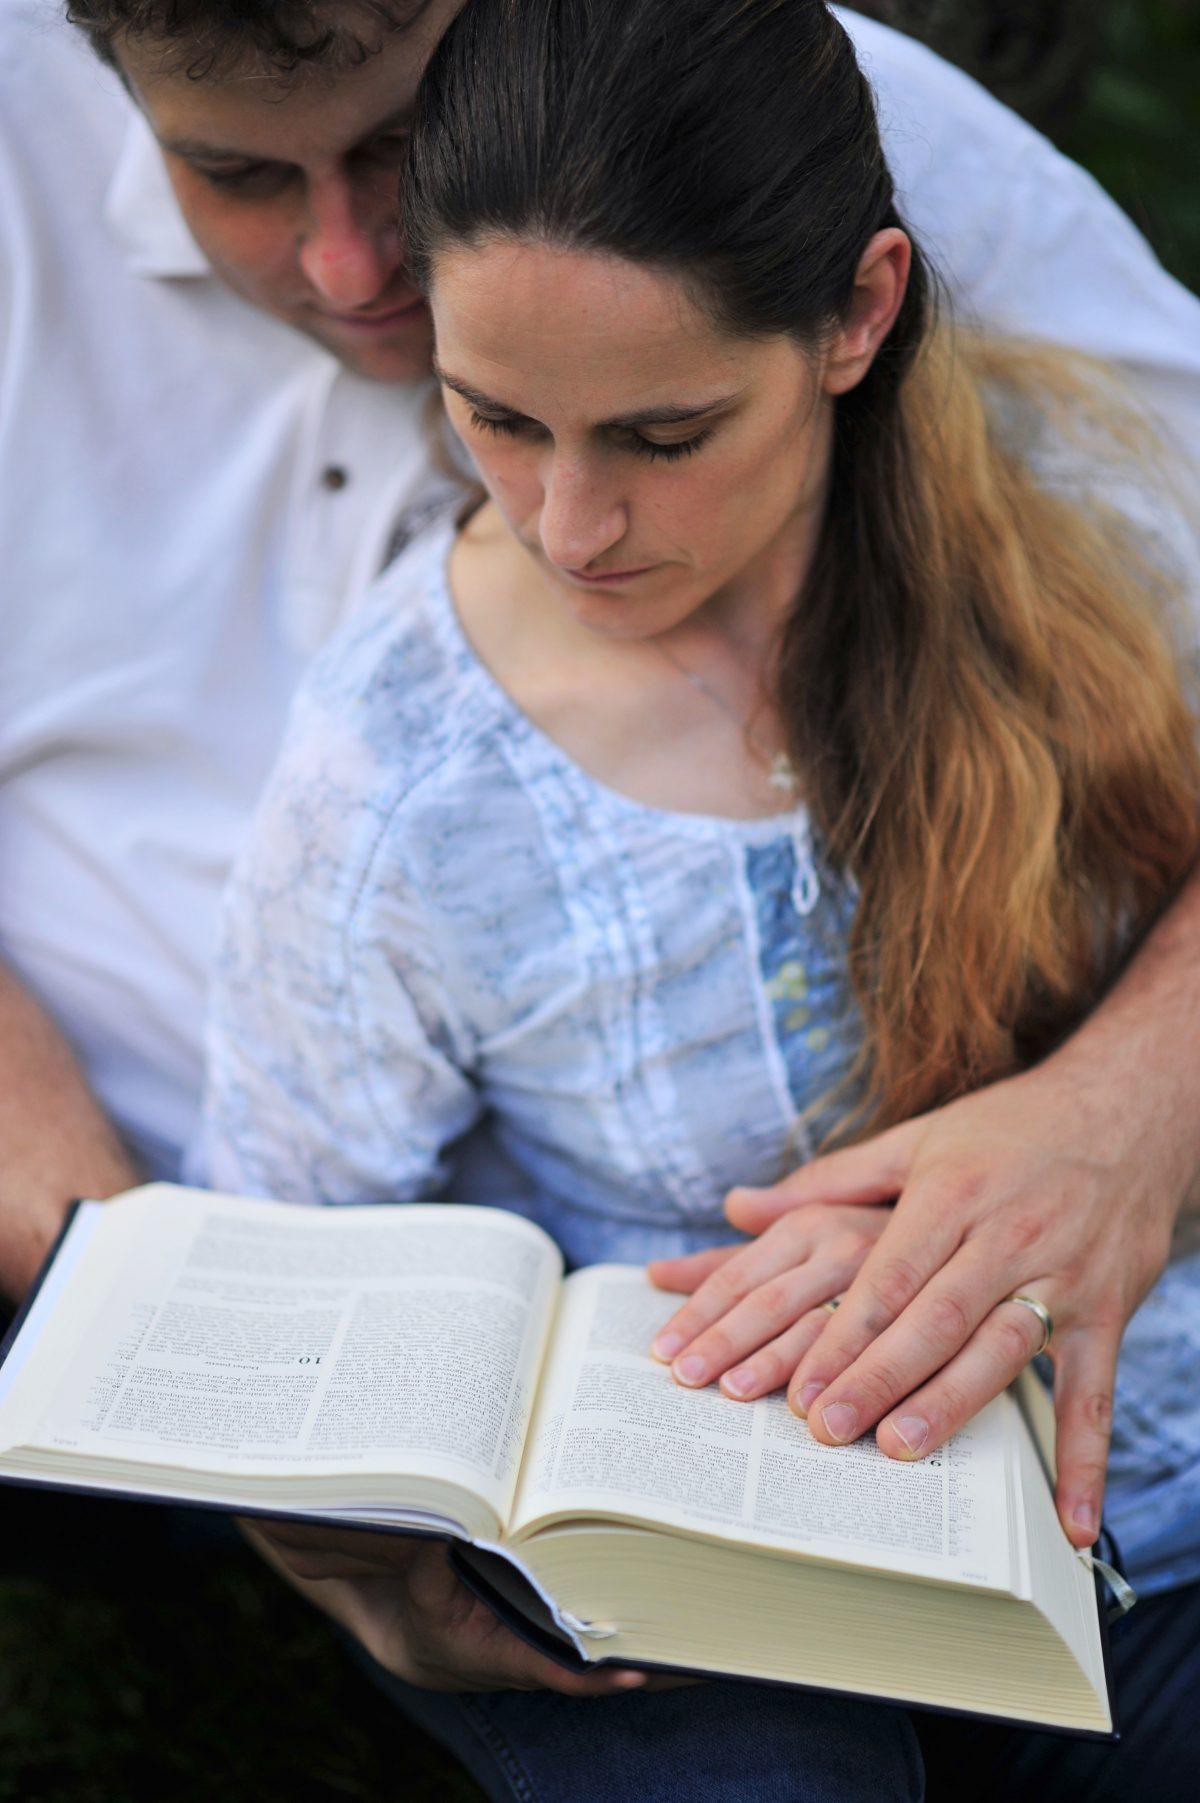 COUPLE READING BIBLE